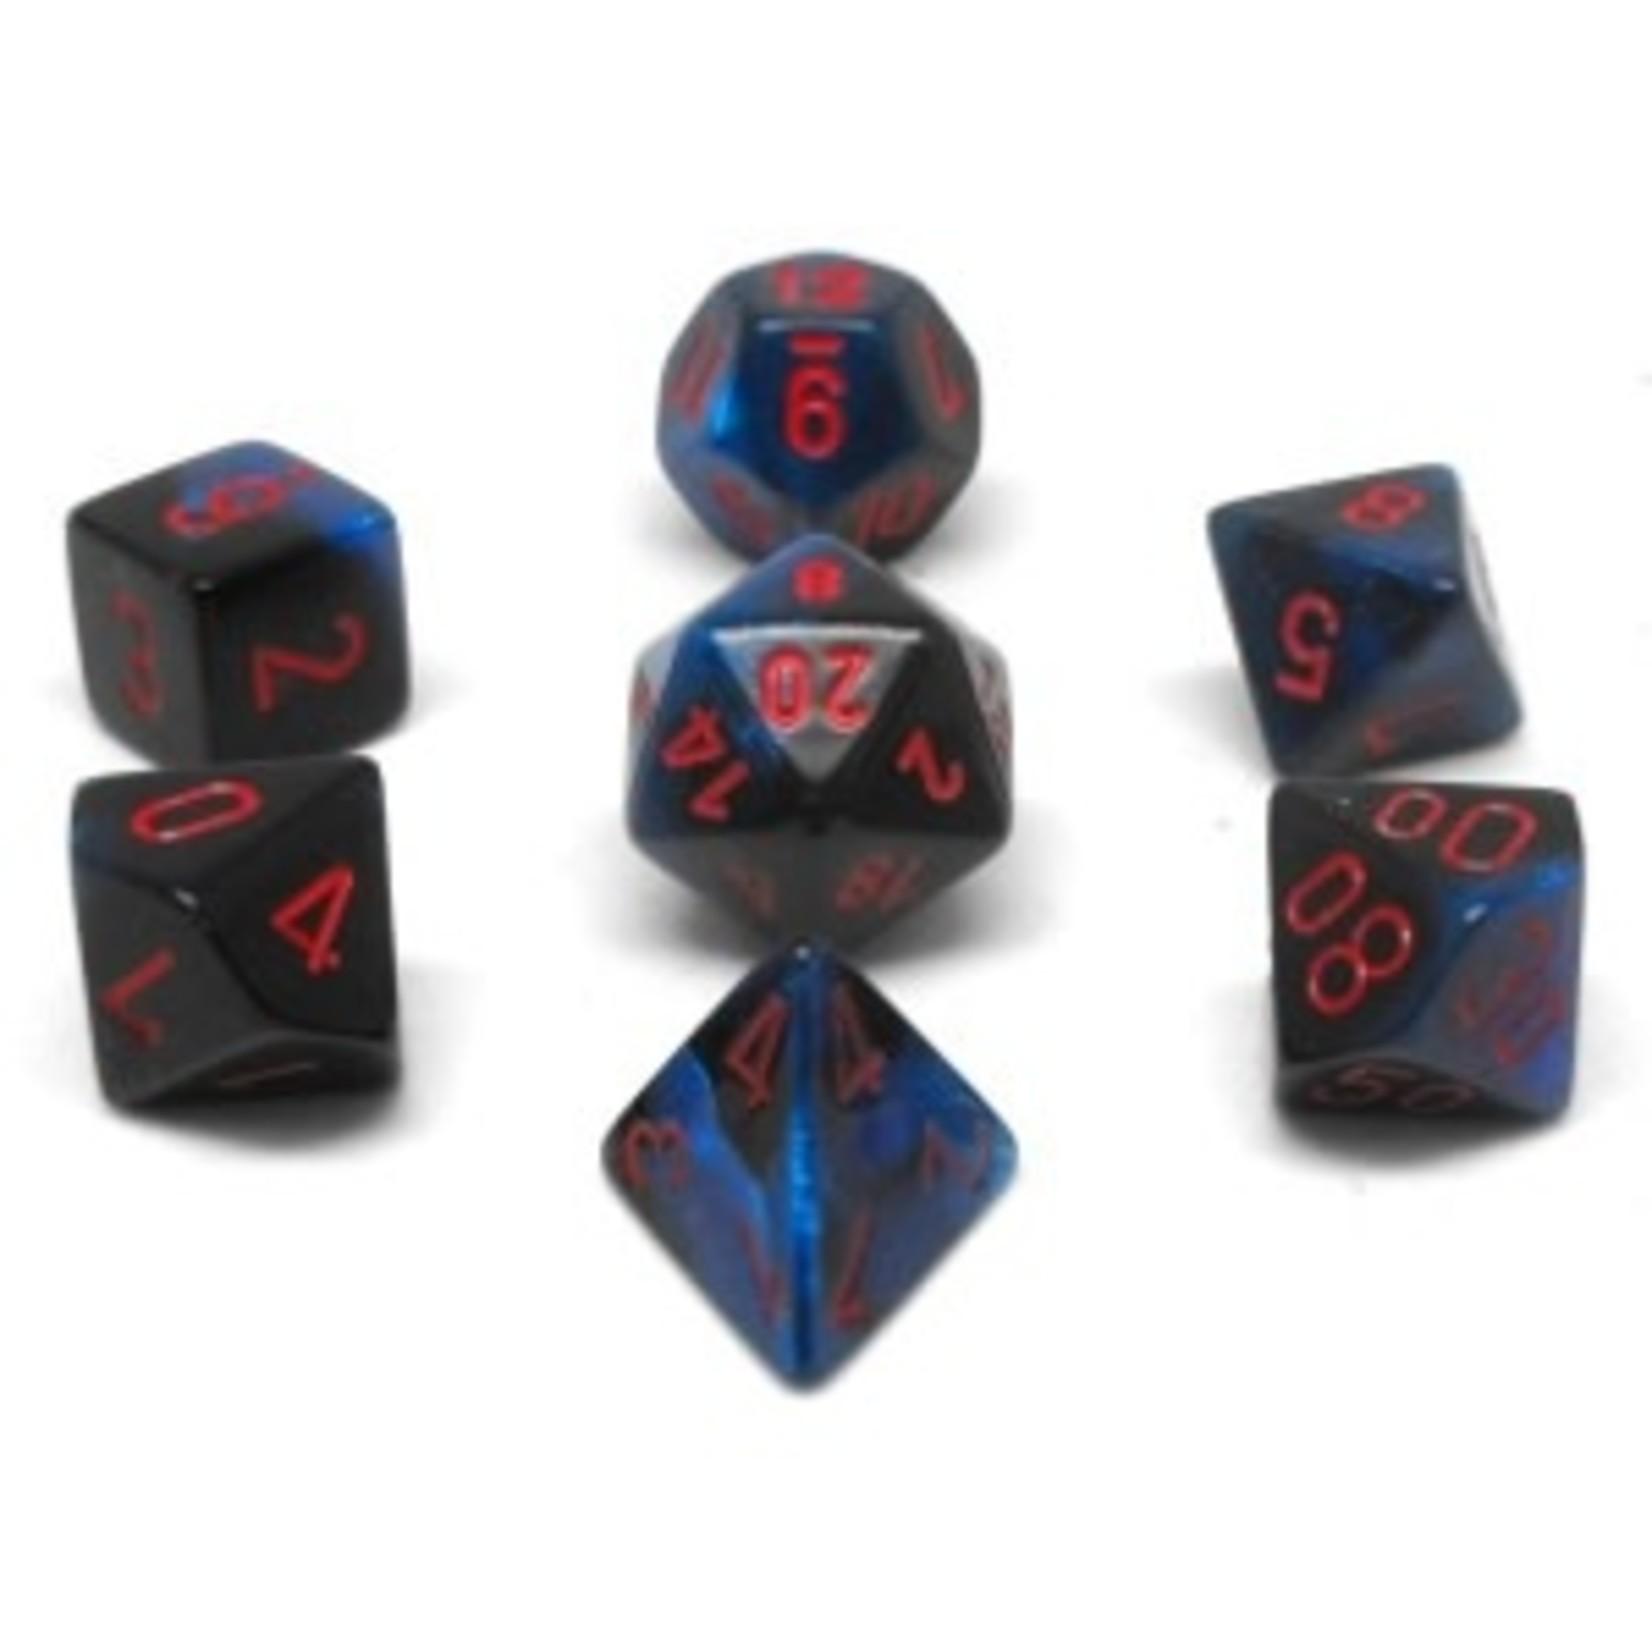 Chessex Set 7D Poly Gemini Black Starlight/Red